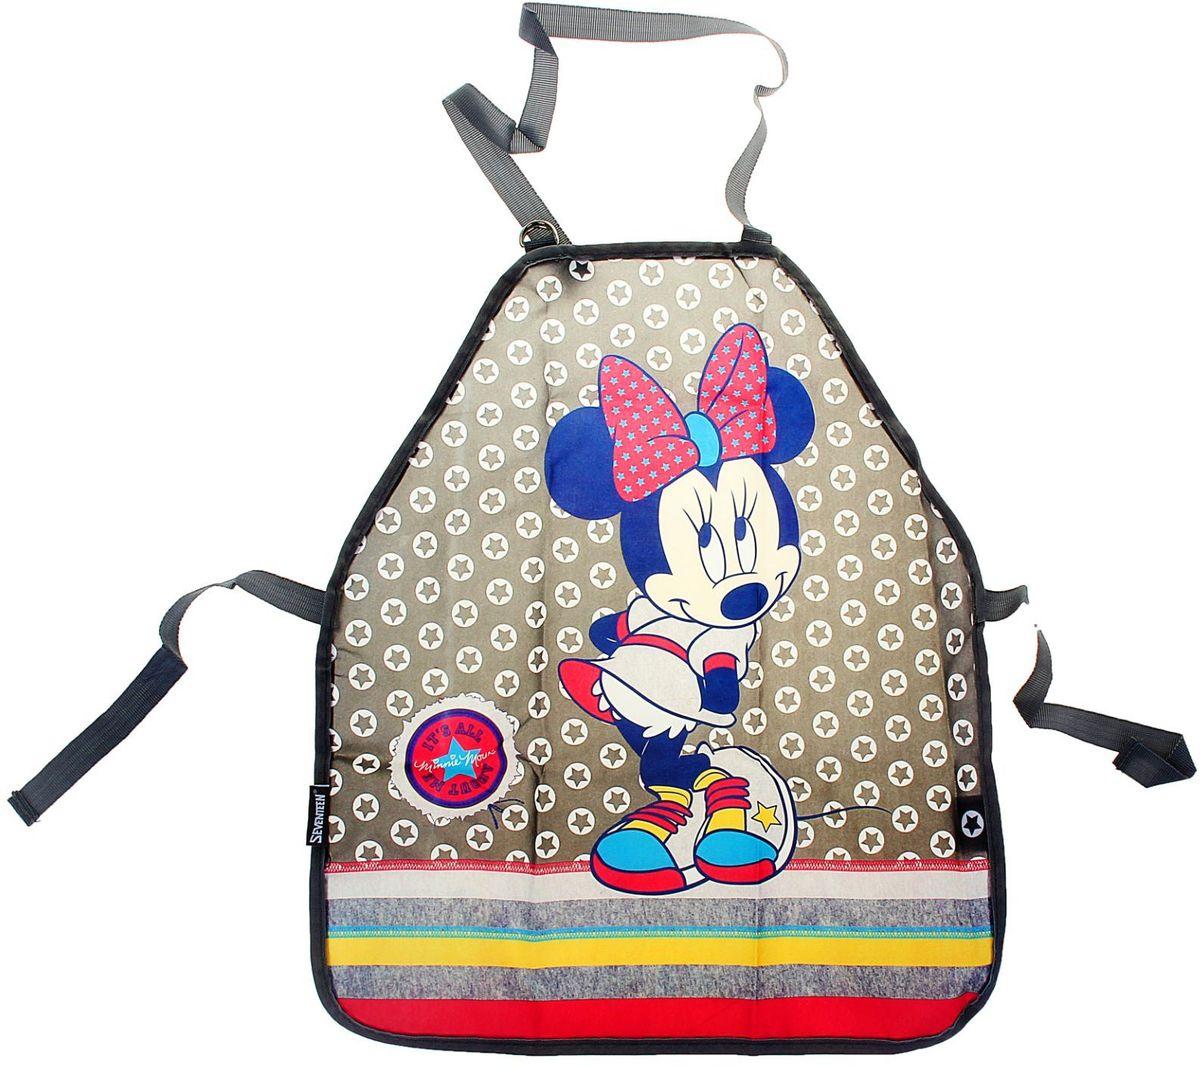 Disney Фартук детский для труда Minnie Mouse -  Аксессуары для труда